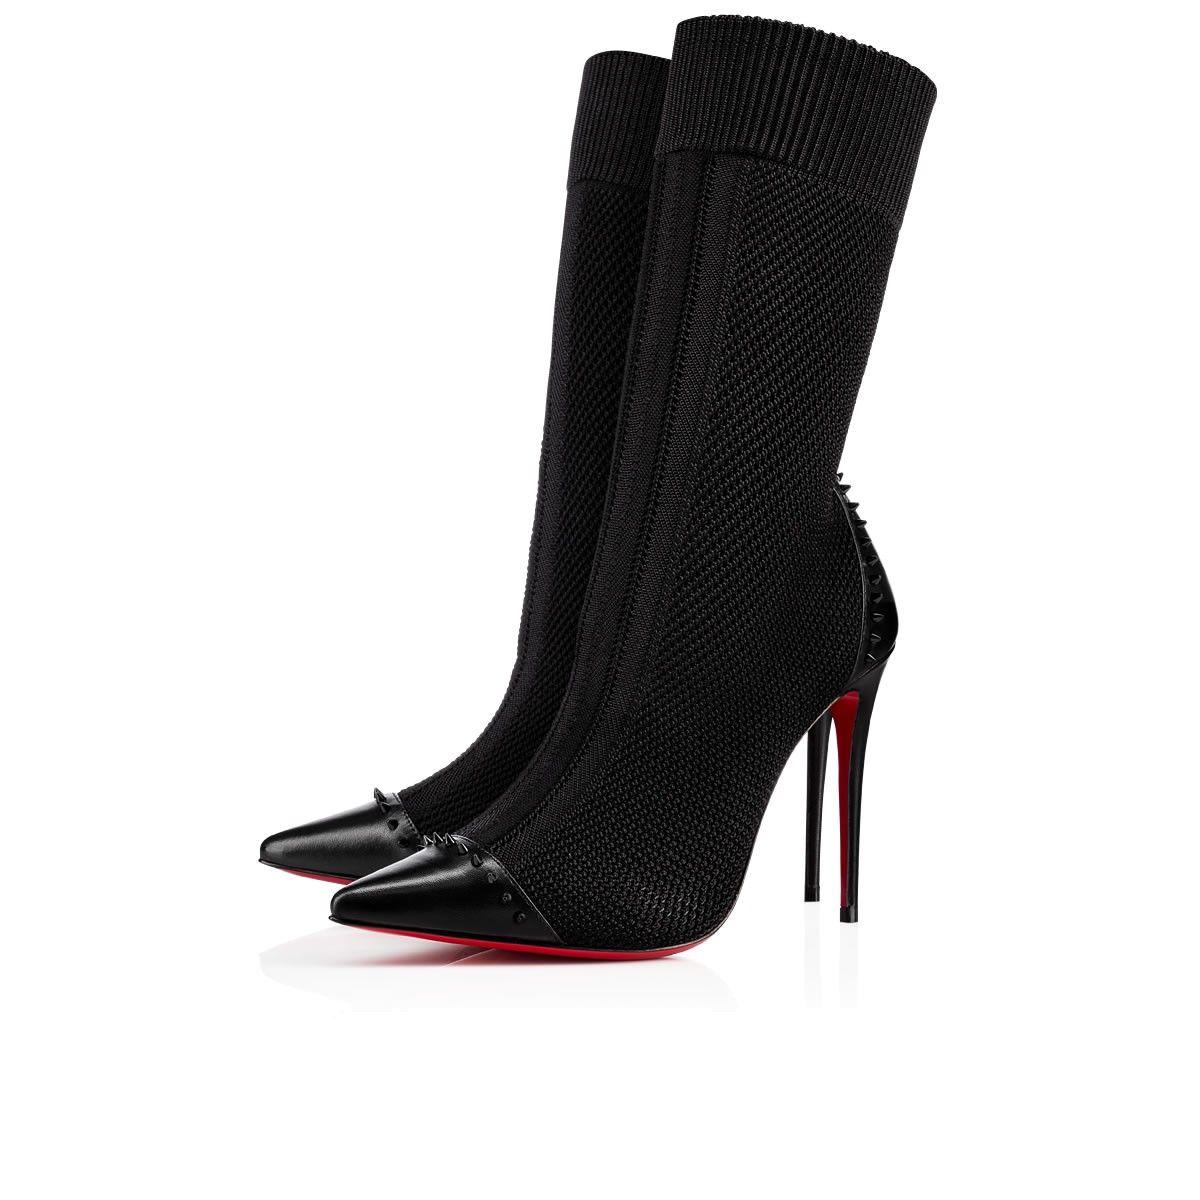 5d72c5184851 Dovi Dova 85 Black Cotton - Women Shoes - Christian Louboutin ...